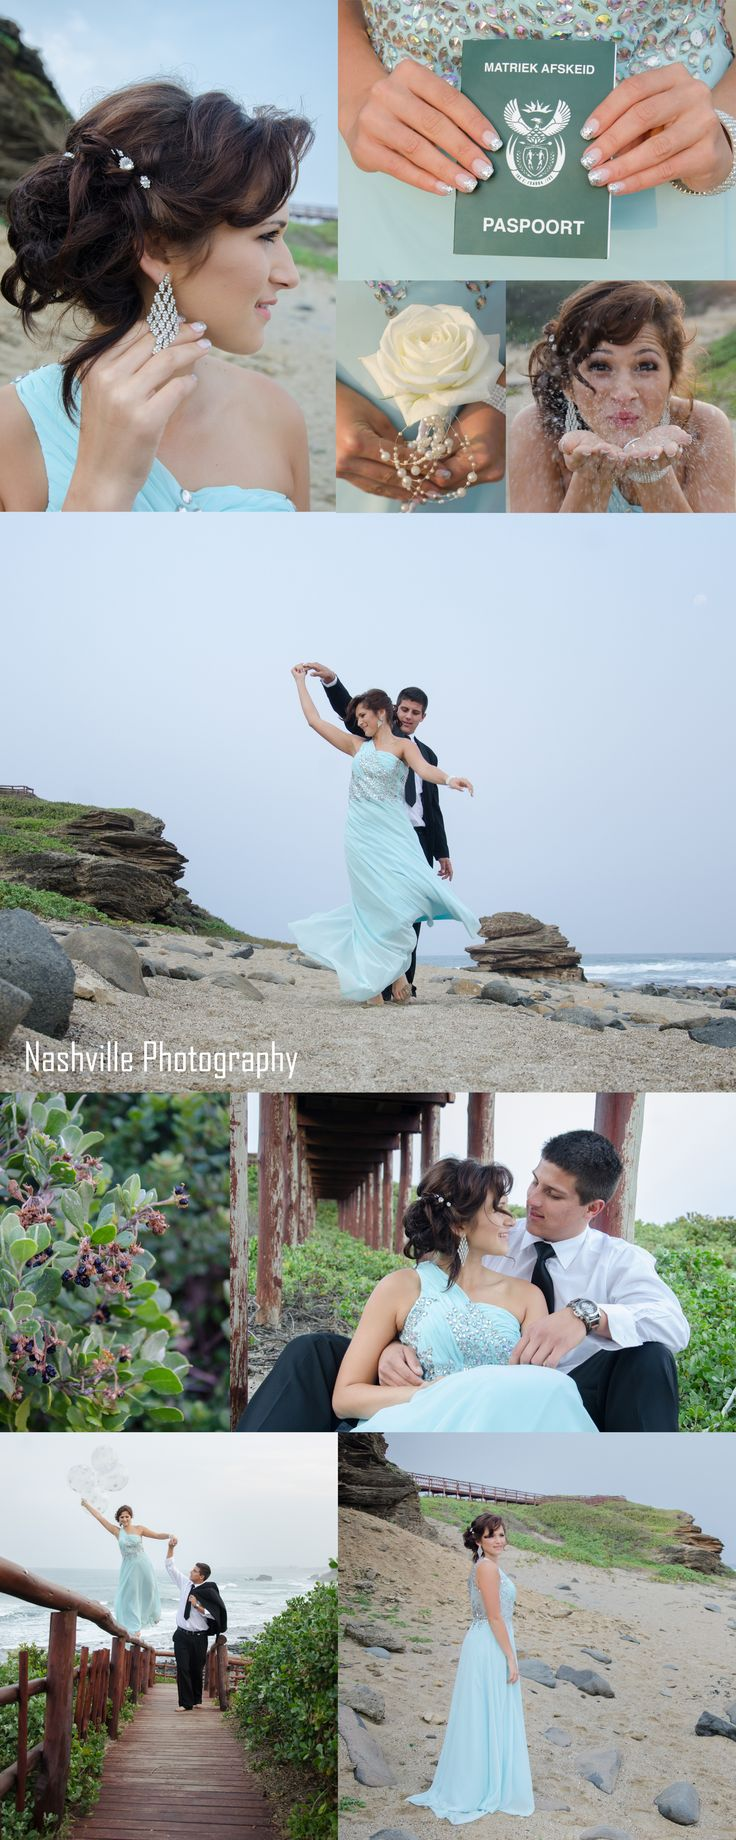 Pose ideas for a prom / matric farewell shoot  #Prom #Dress #Beach #Barefoot #Whiterose #glitter #Beautiful #Photography